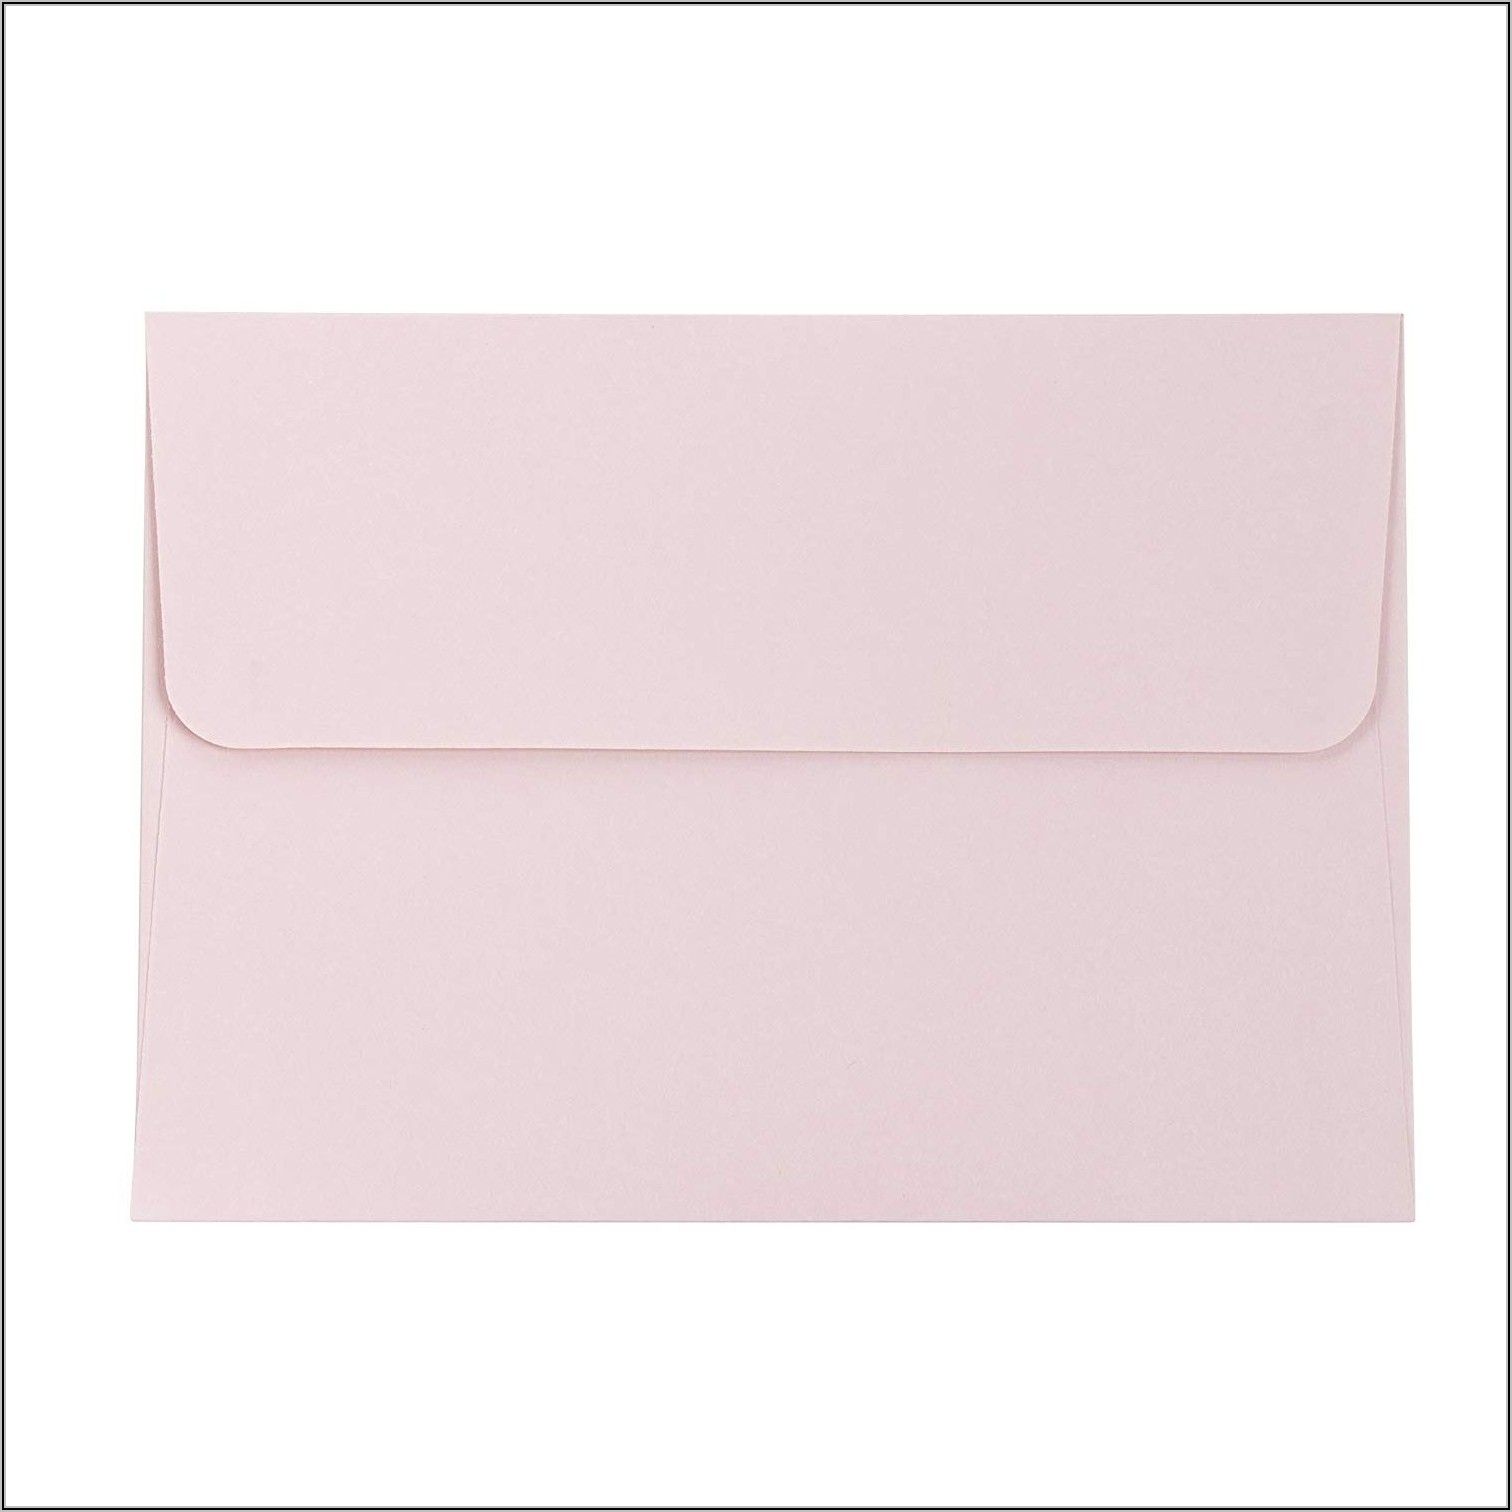 5x7 Rose Gold Envelopes